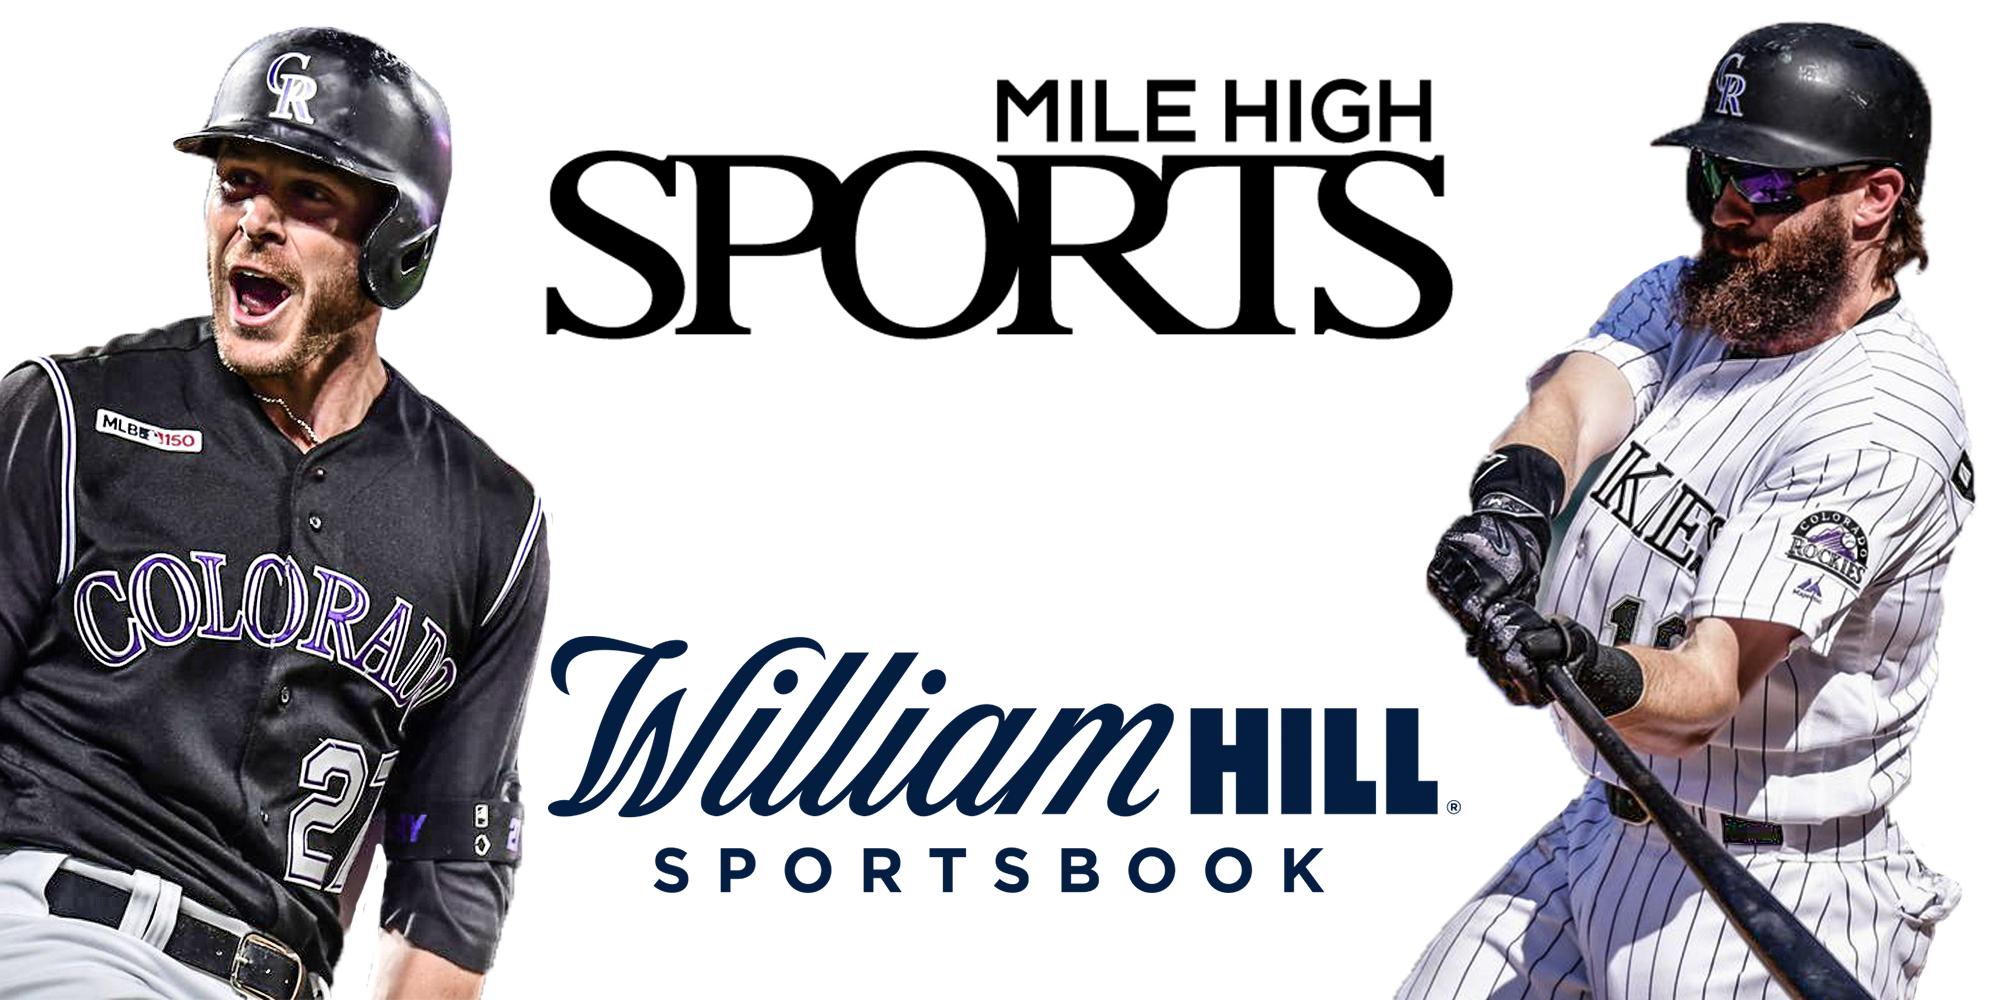 Mile High Sports, William Hill Colorado Sportsbook, Trevor Story, Charlie Blackmon